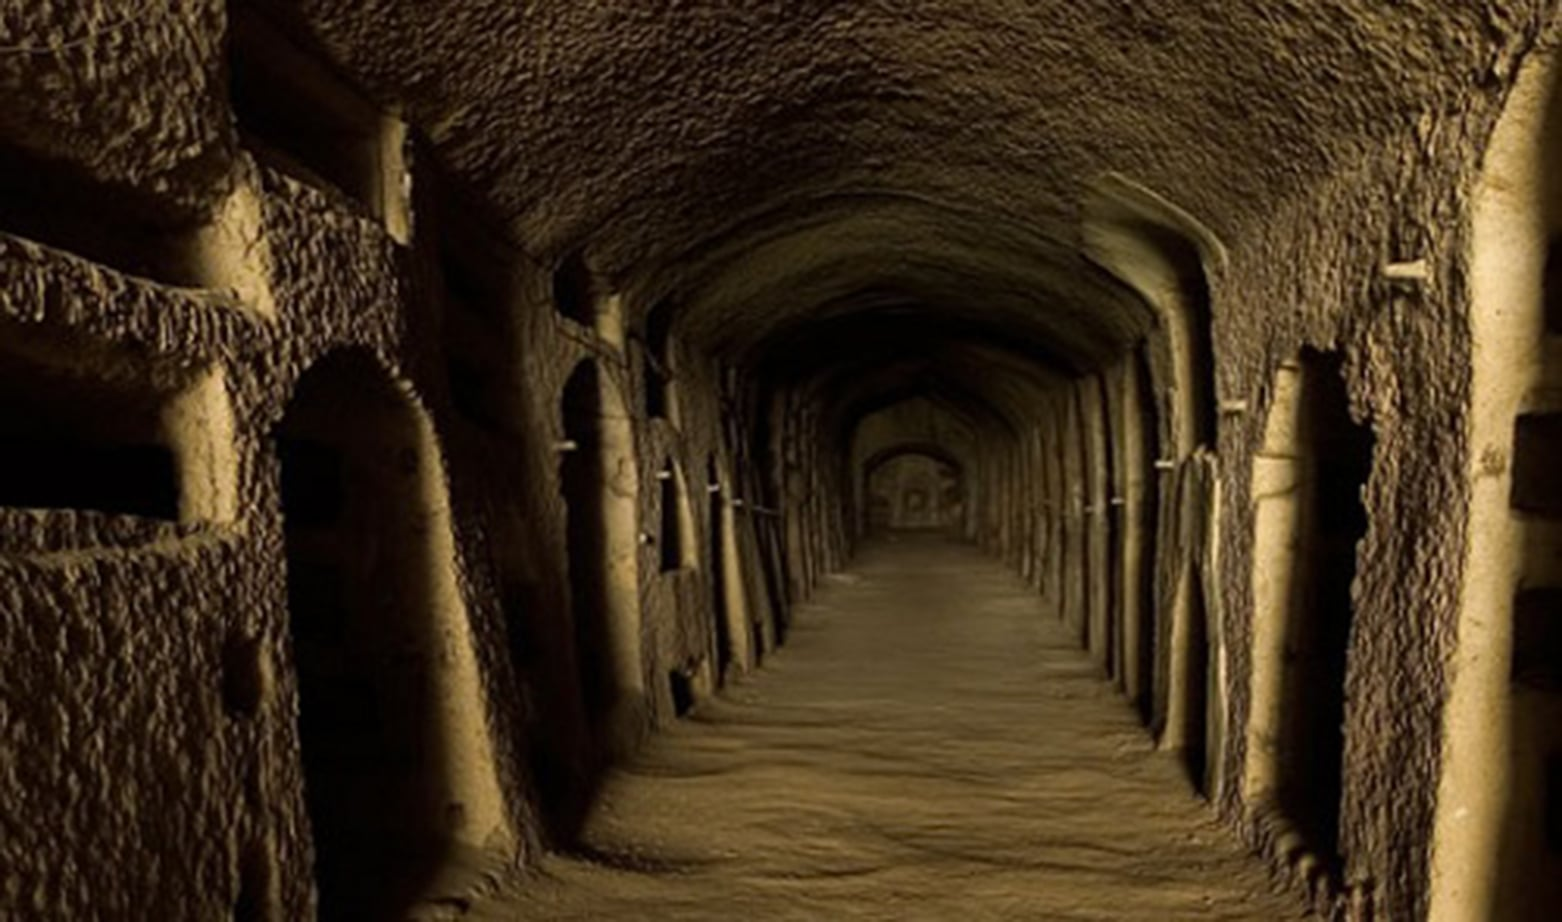 Catacombe-san-gennaro_500 300 dpi.jpg